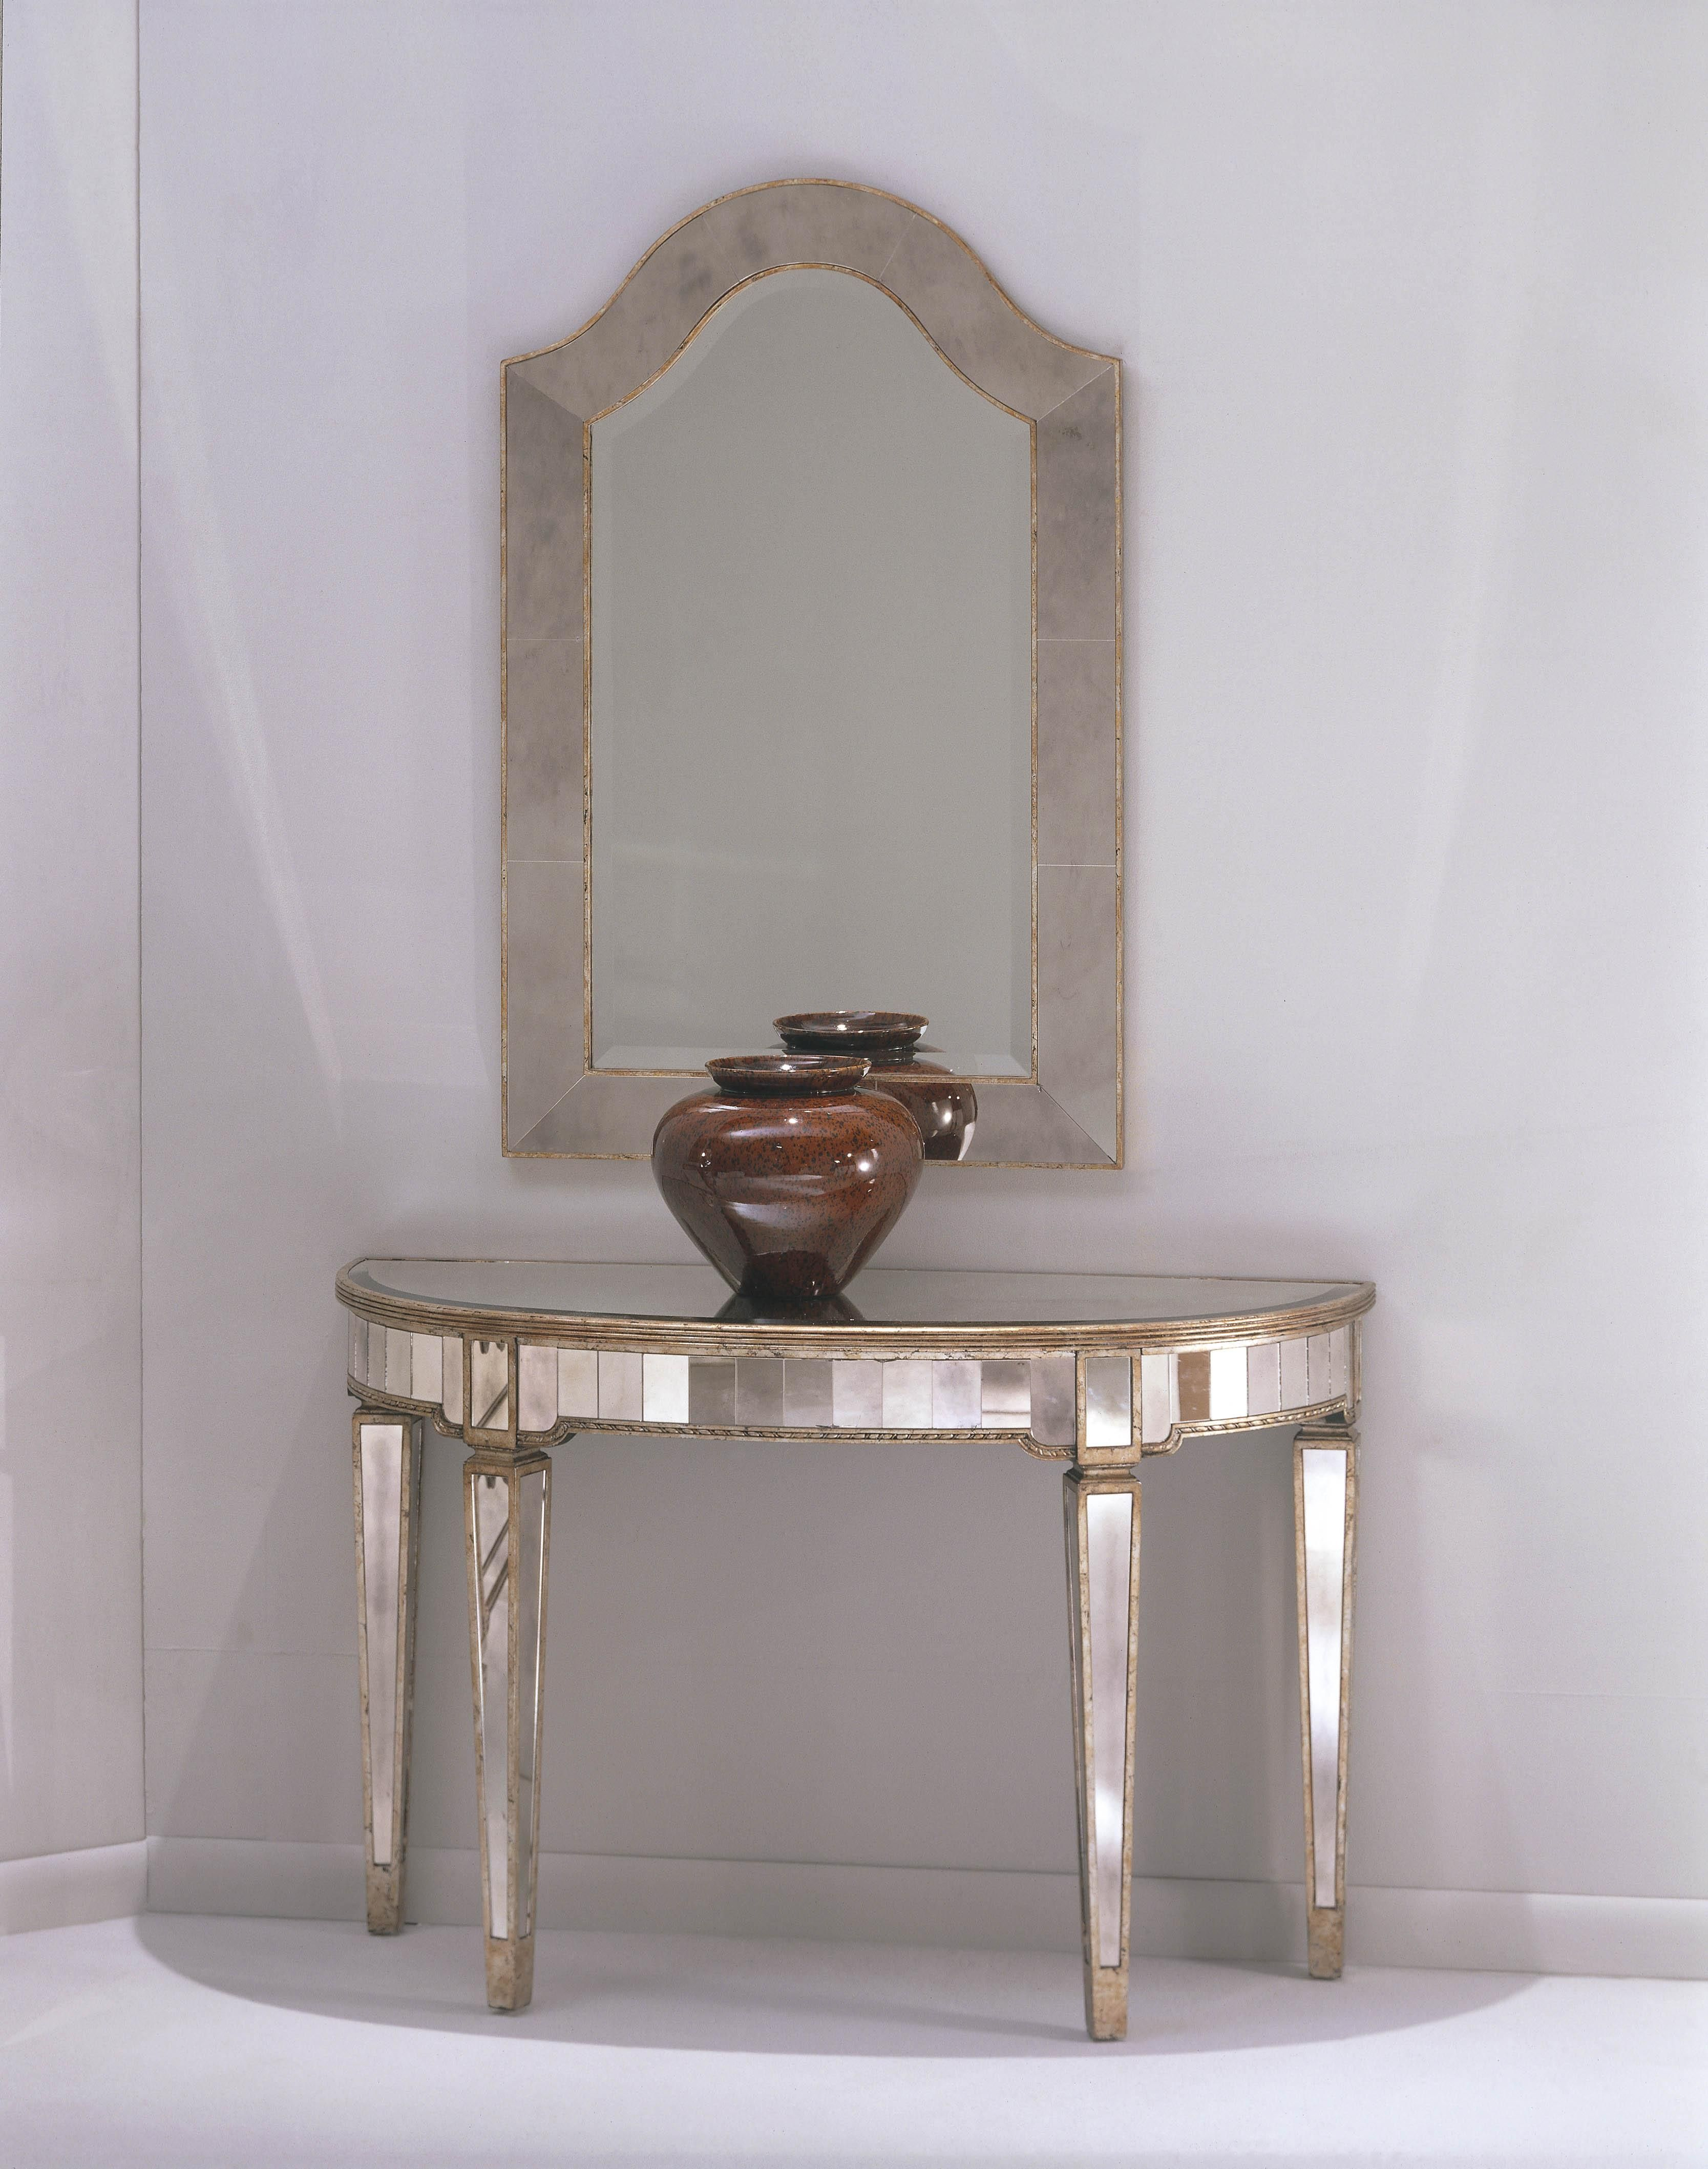 Borghese Mirrored Furniture